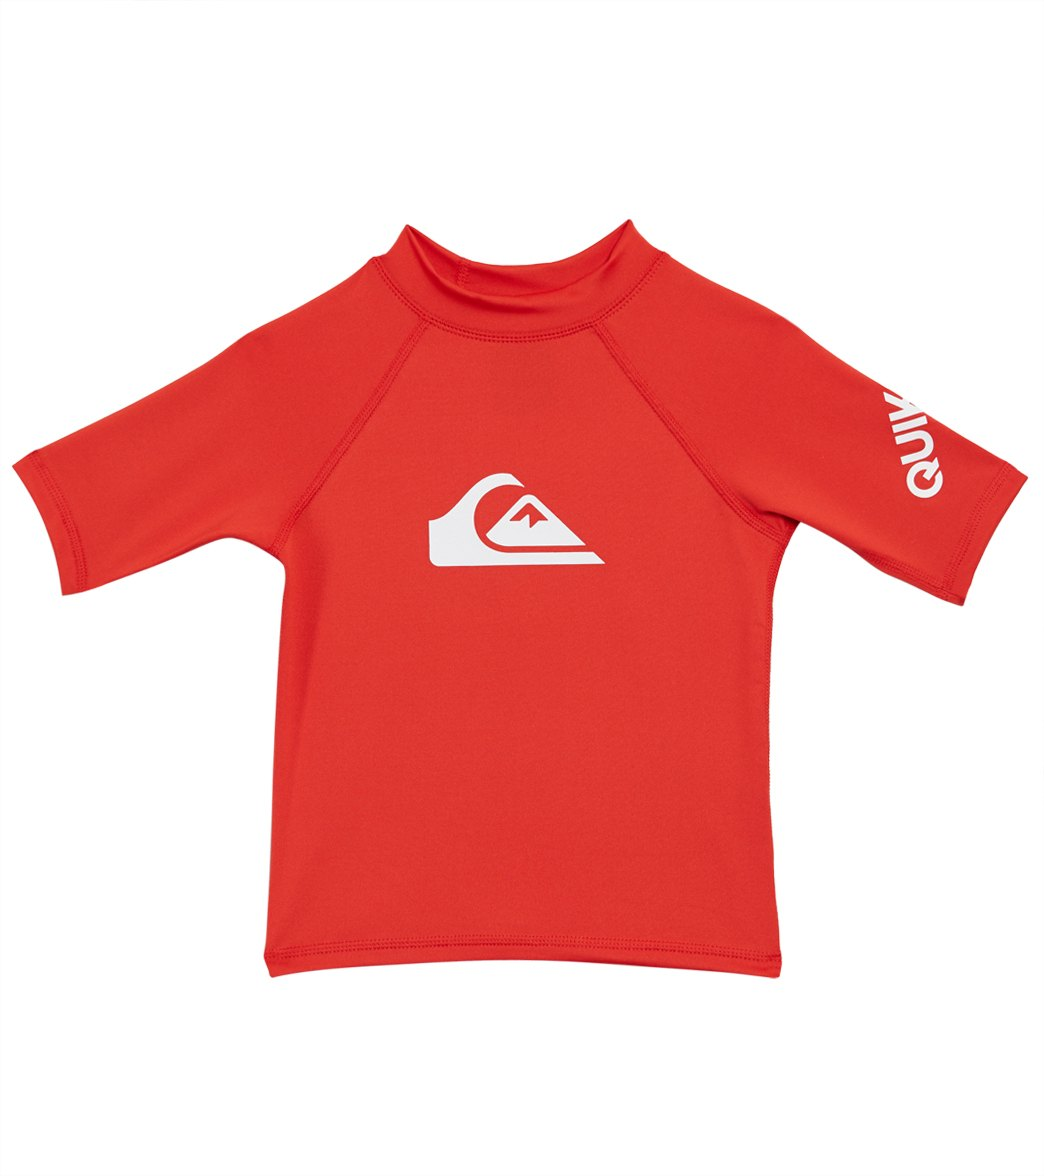 7e3bb0d3279b3 Quiksilver All Time Short Sleeve Rash Guard (Toddler, Little Kid) at  SwimOutlet.com